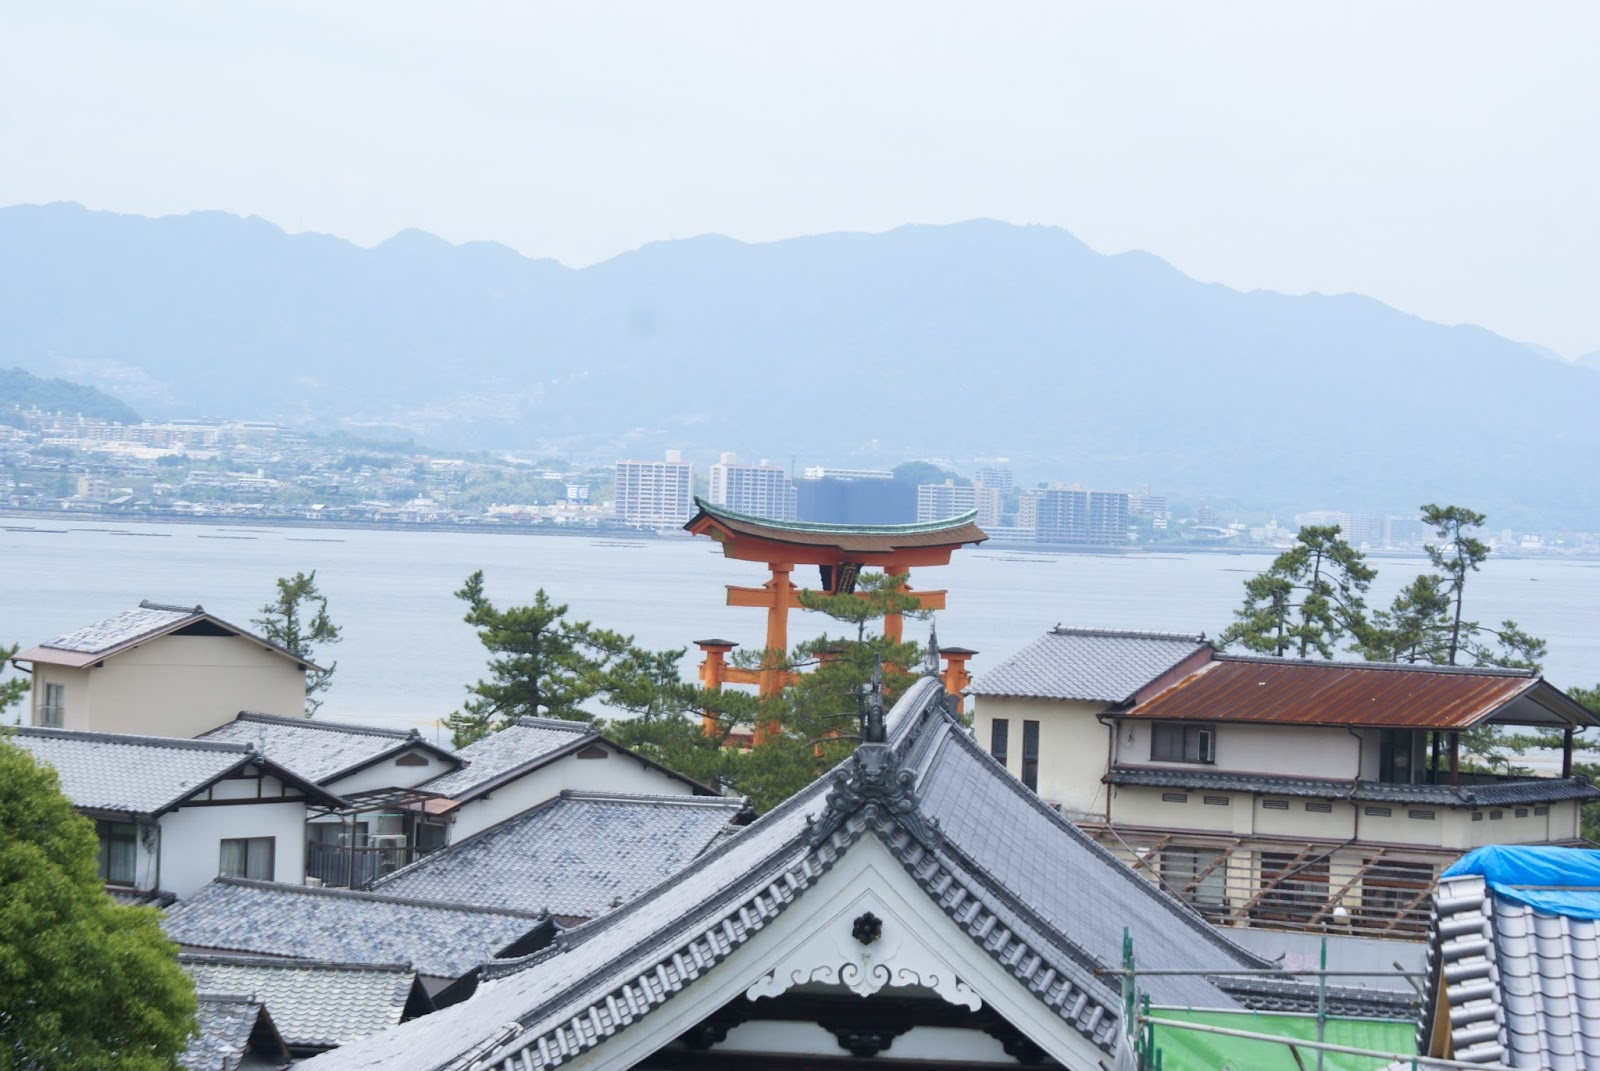 miyajima itsukushima torii roof japan